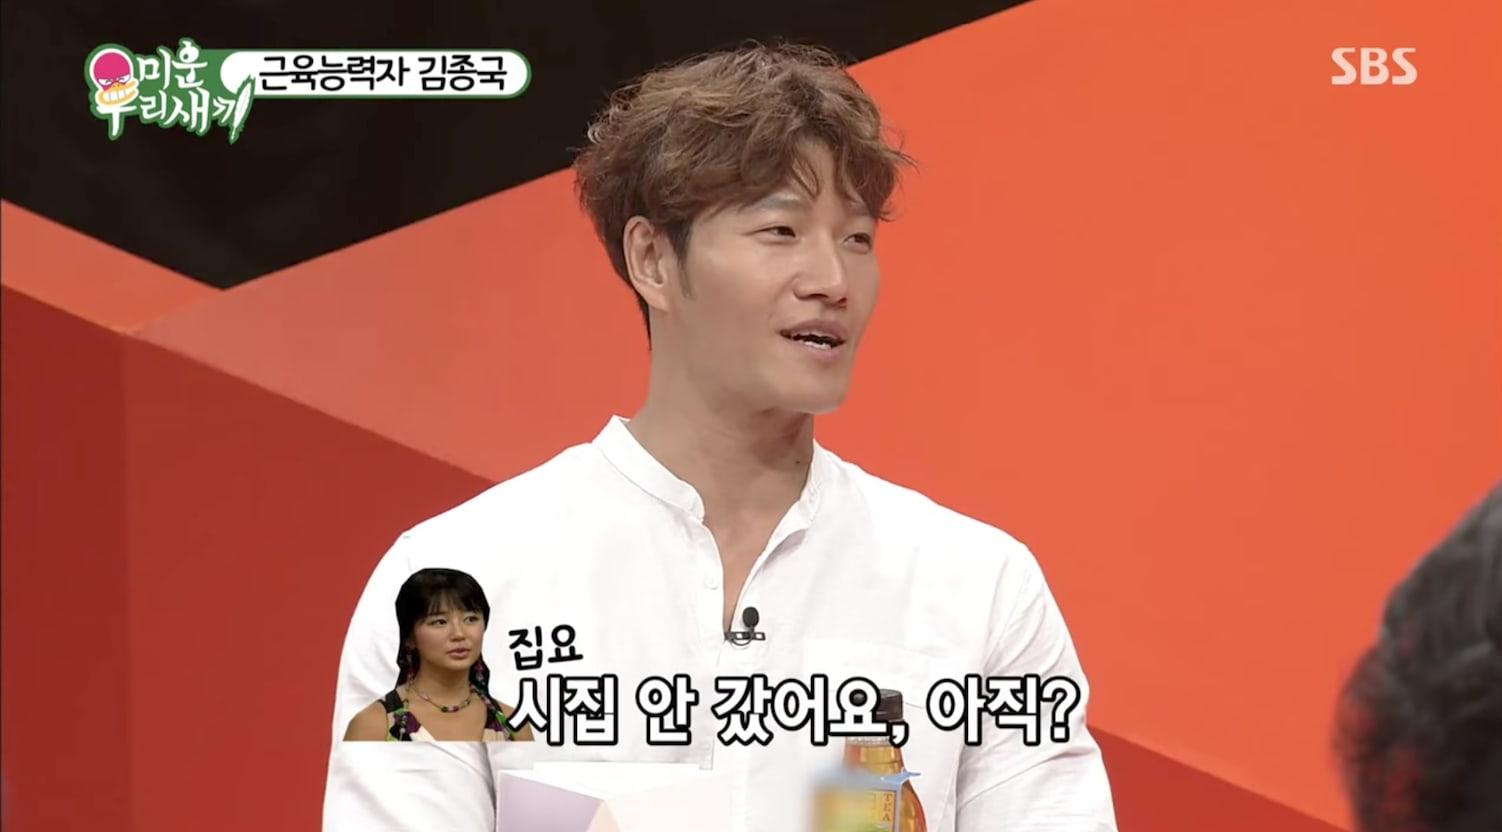 Watch: Kim Jong Kook Reacts To Suggestion To Marry Yoon Eun Hye